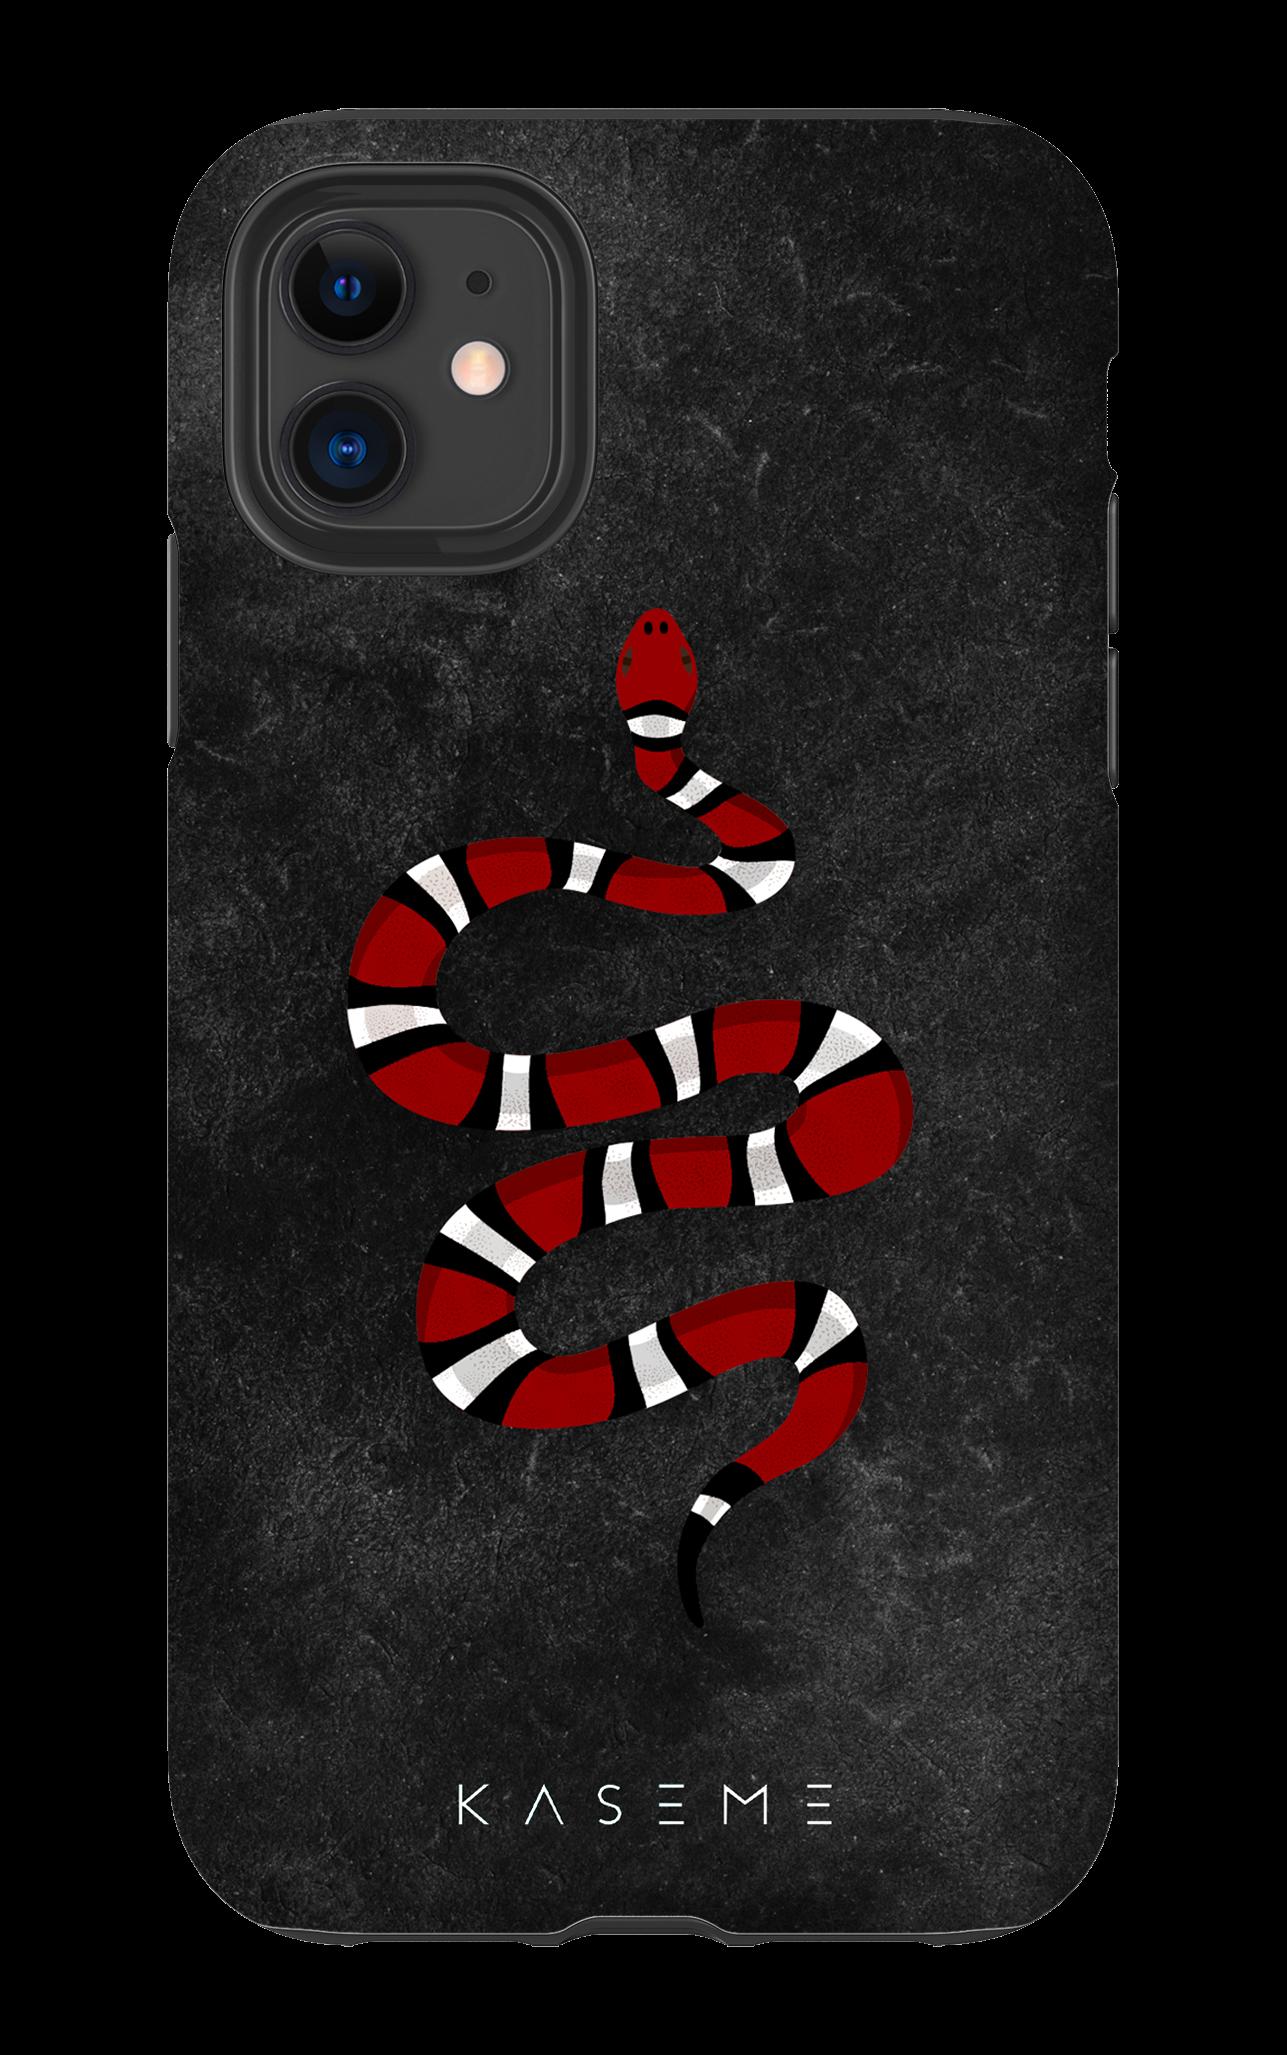 Savage phone case